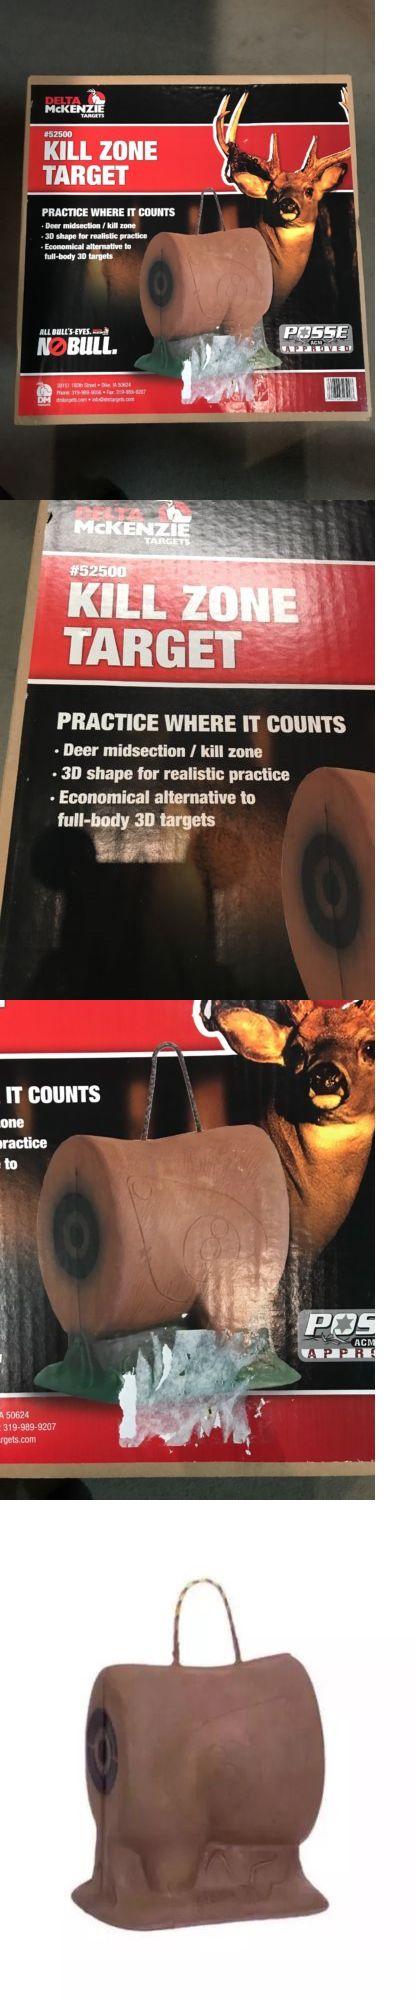 Decoys 36249: Delta Mckenzie Hunting 52500 Backyard 3D - Kill Zone Portable Mid Archery Target -> BUY IT NOW ONLY: $69.99 on eBay!